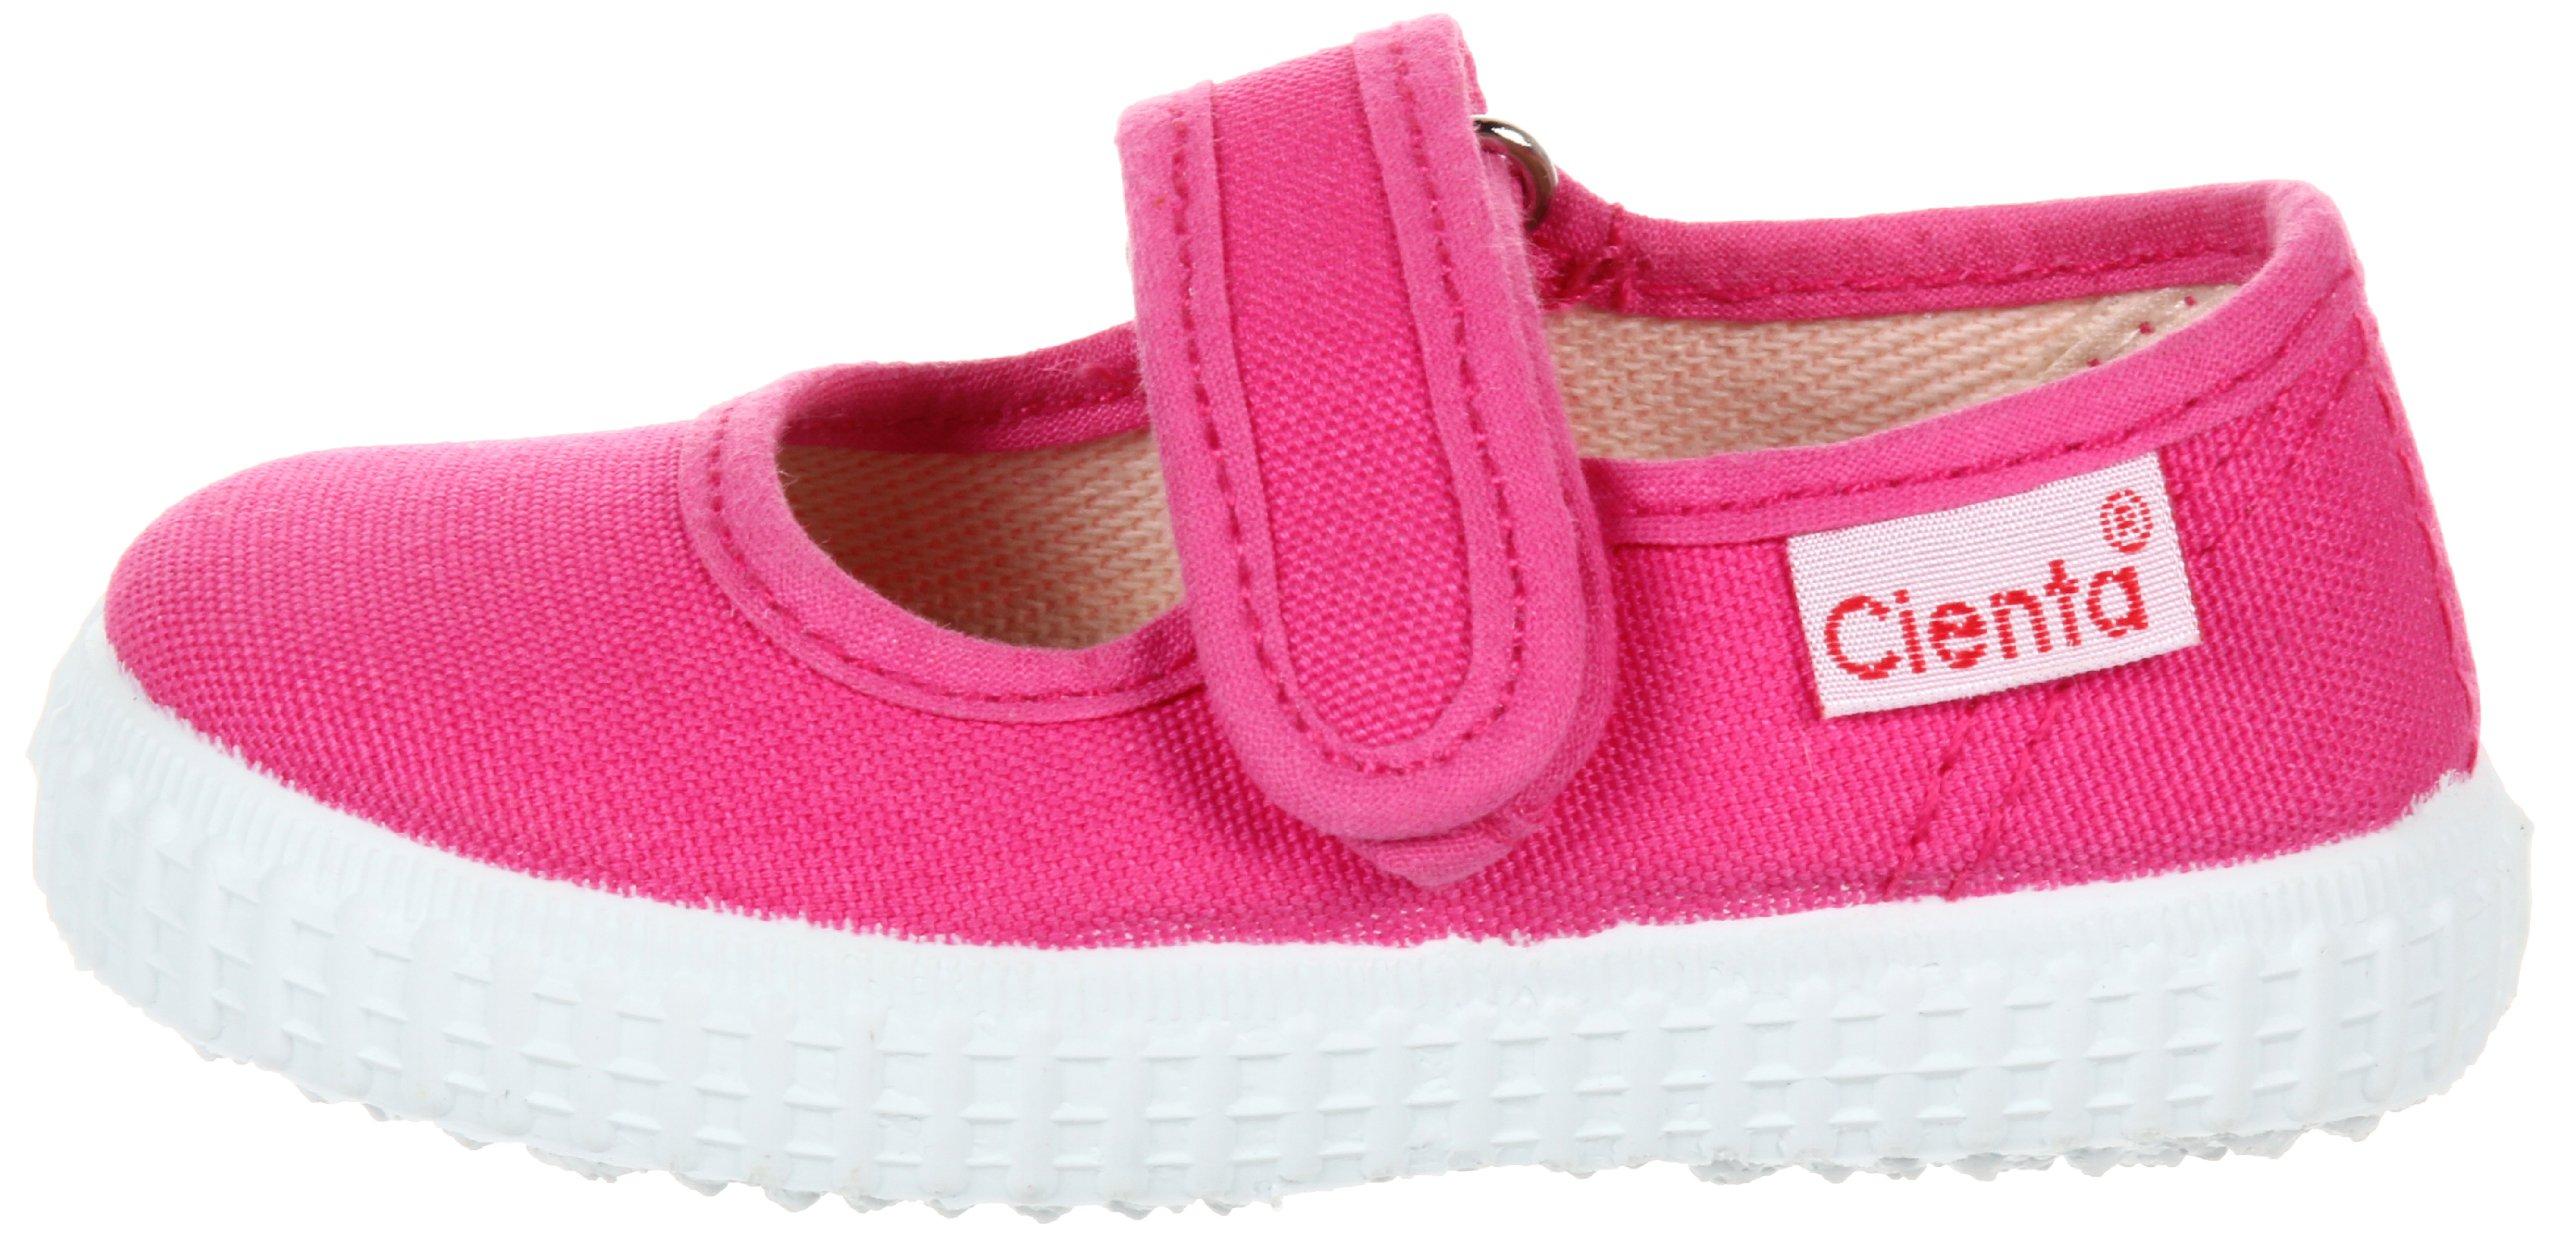 Cienta Girls Mary Jane Shoe, Fuchsia, 19 M EU / 3.5 M US Toddler by Cienta (Image #5)